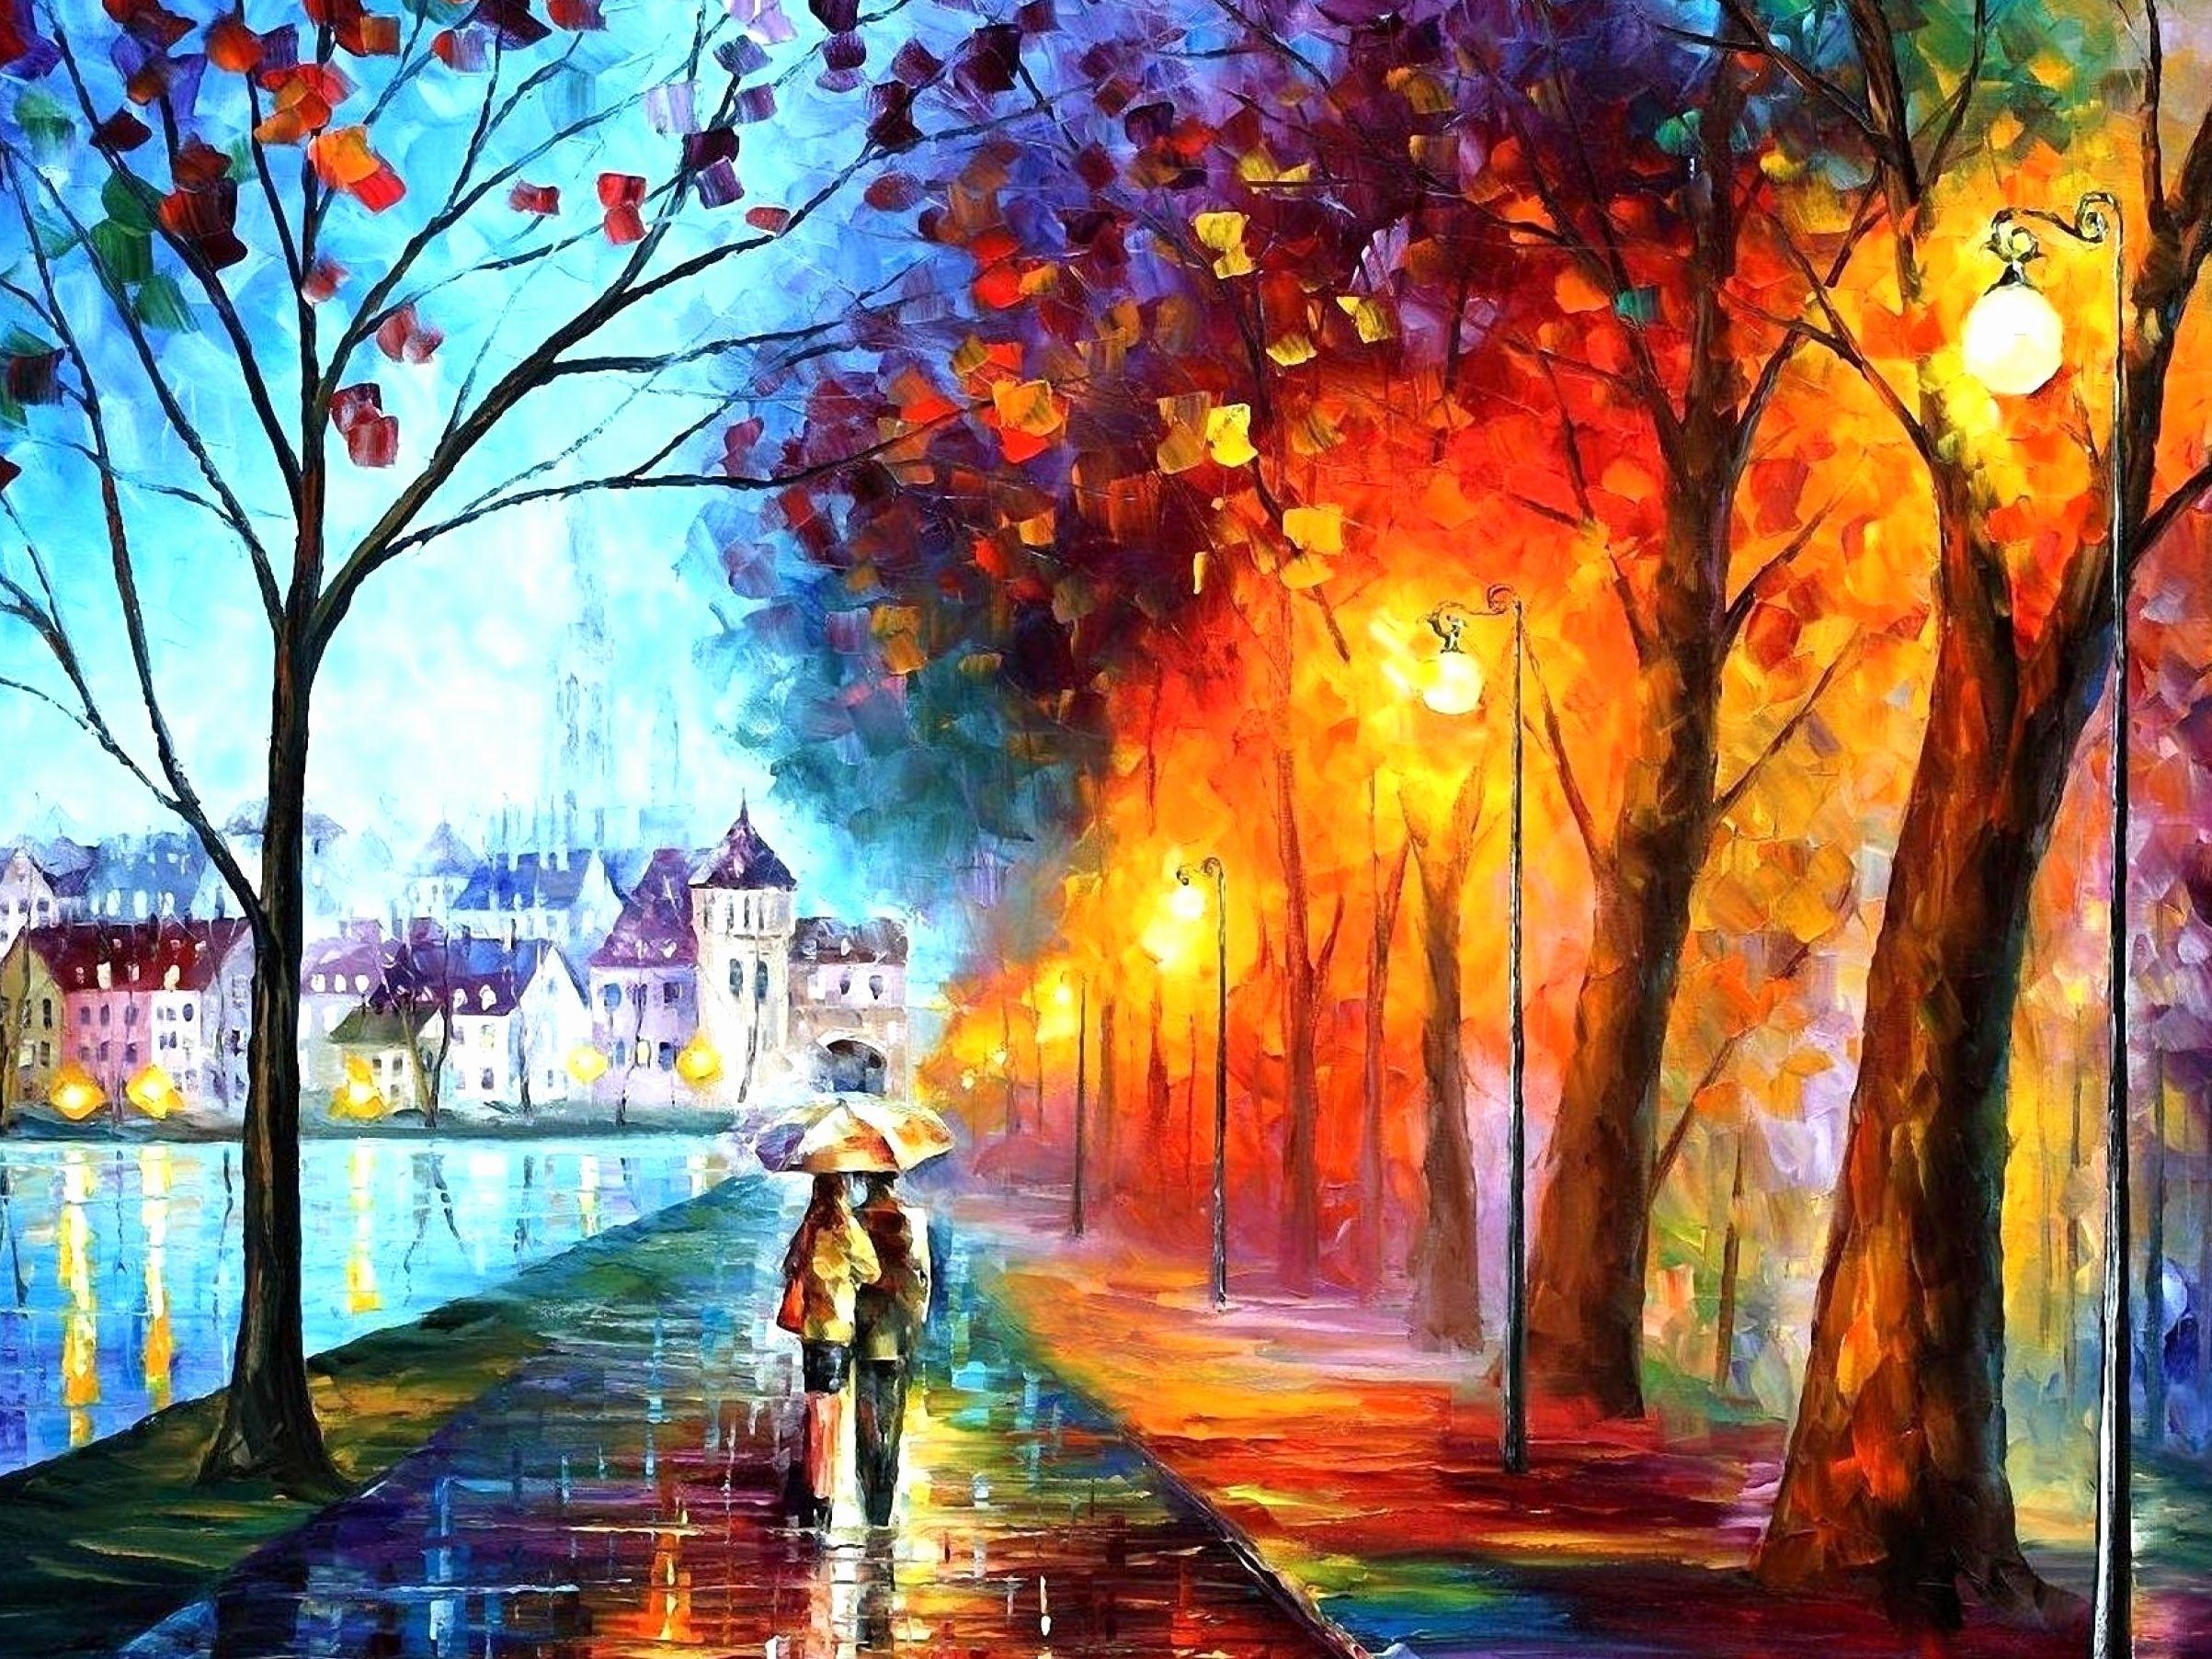 8k Rain Couple Wallpaper: Rain Umbrella Wallpapers